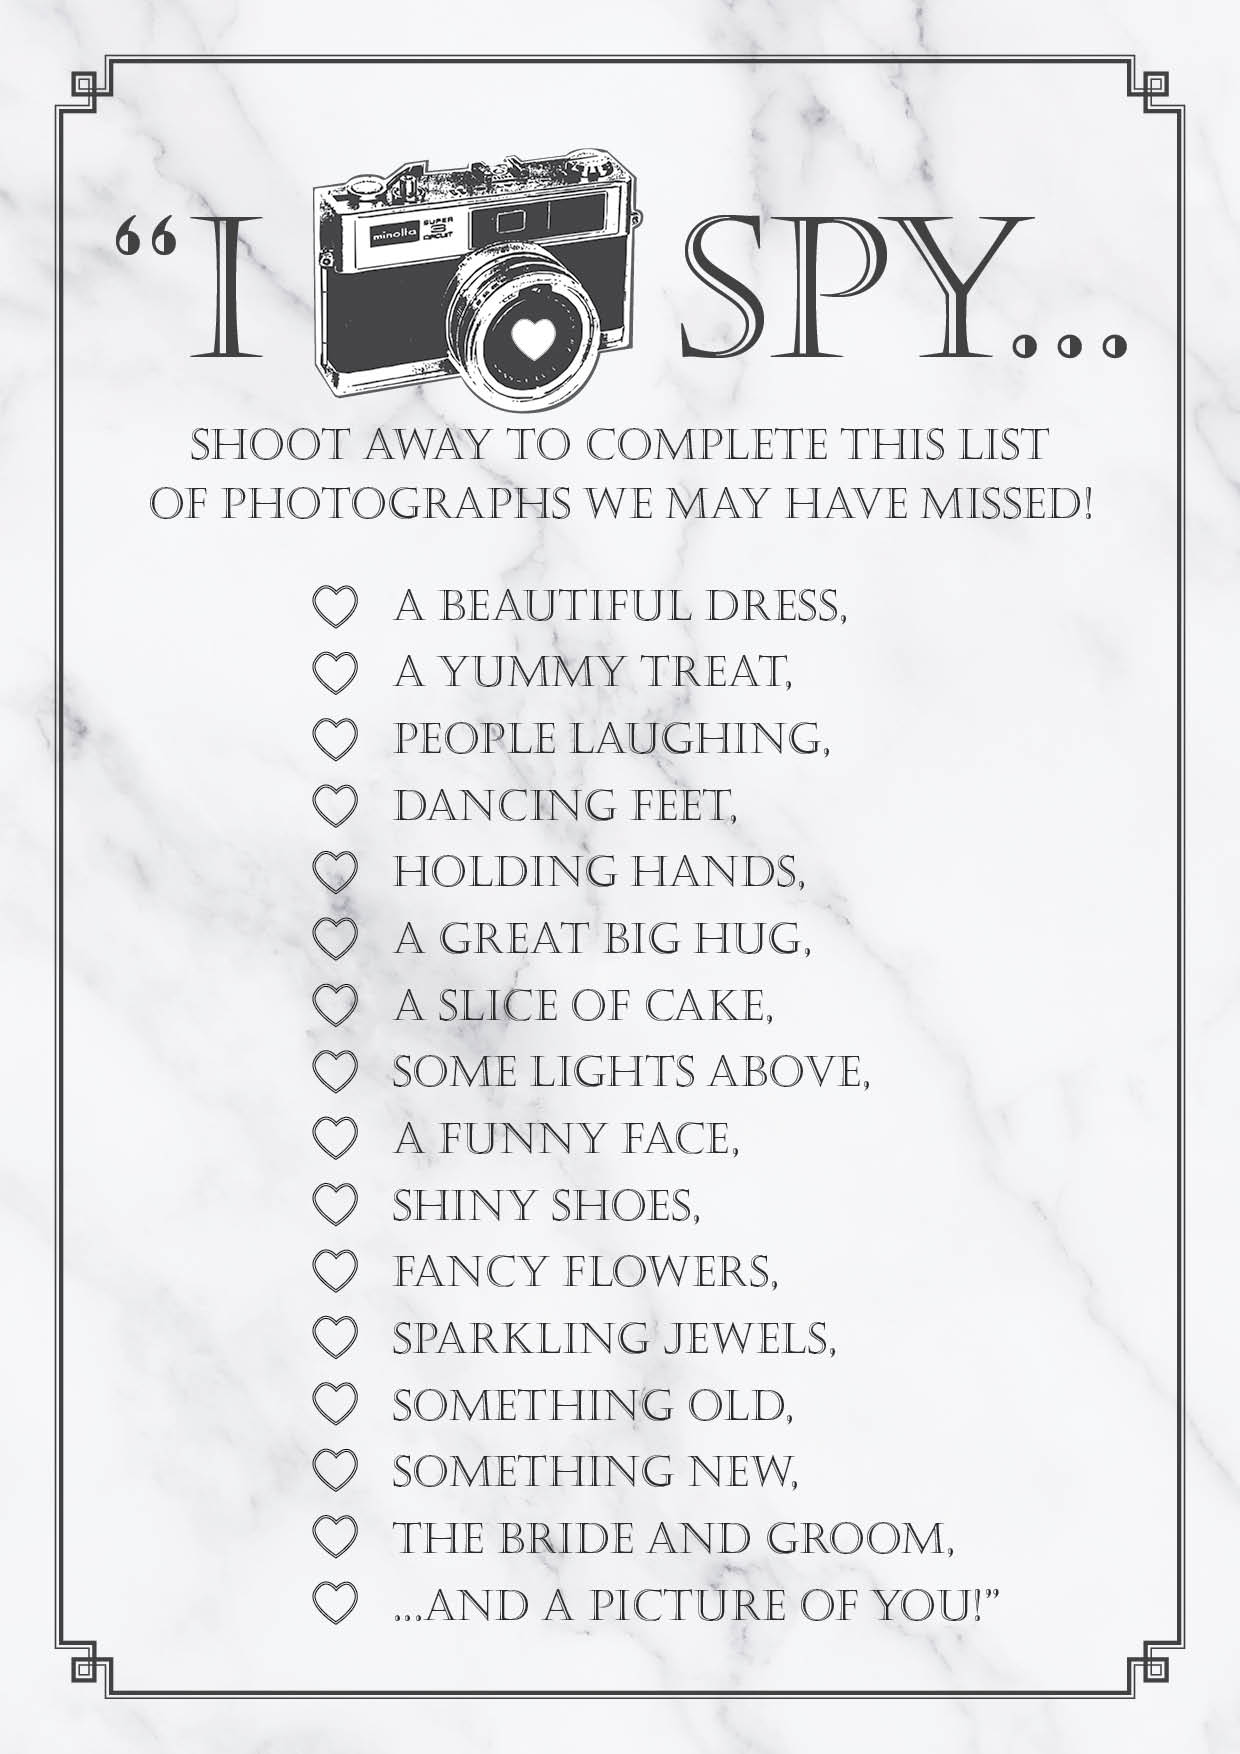 I spy list